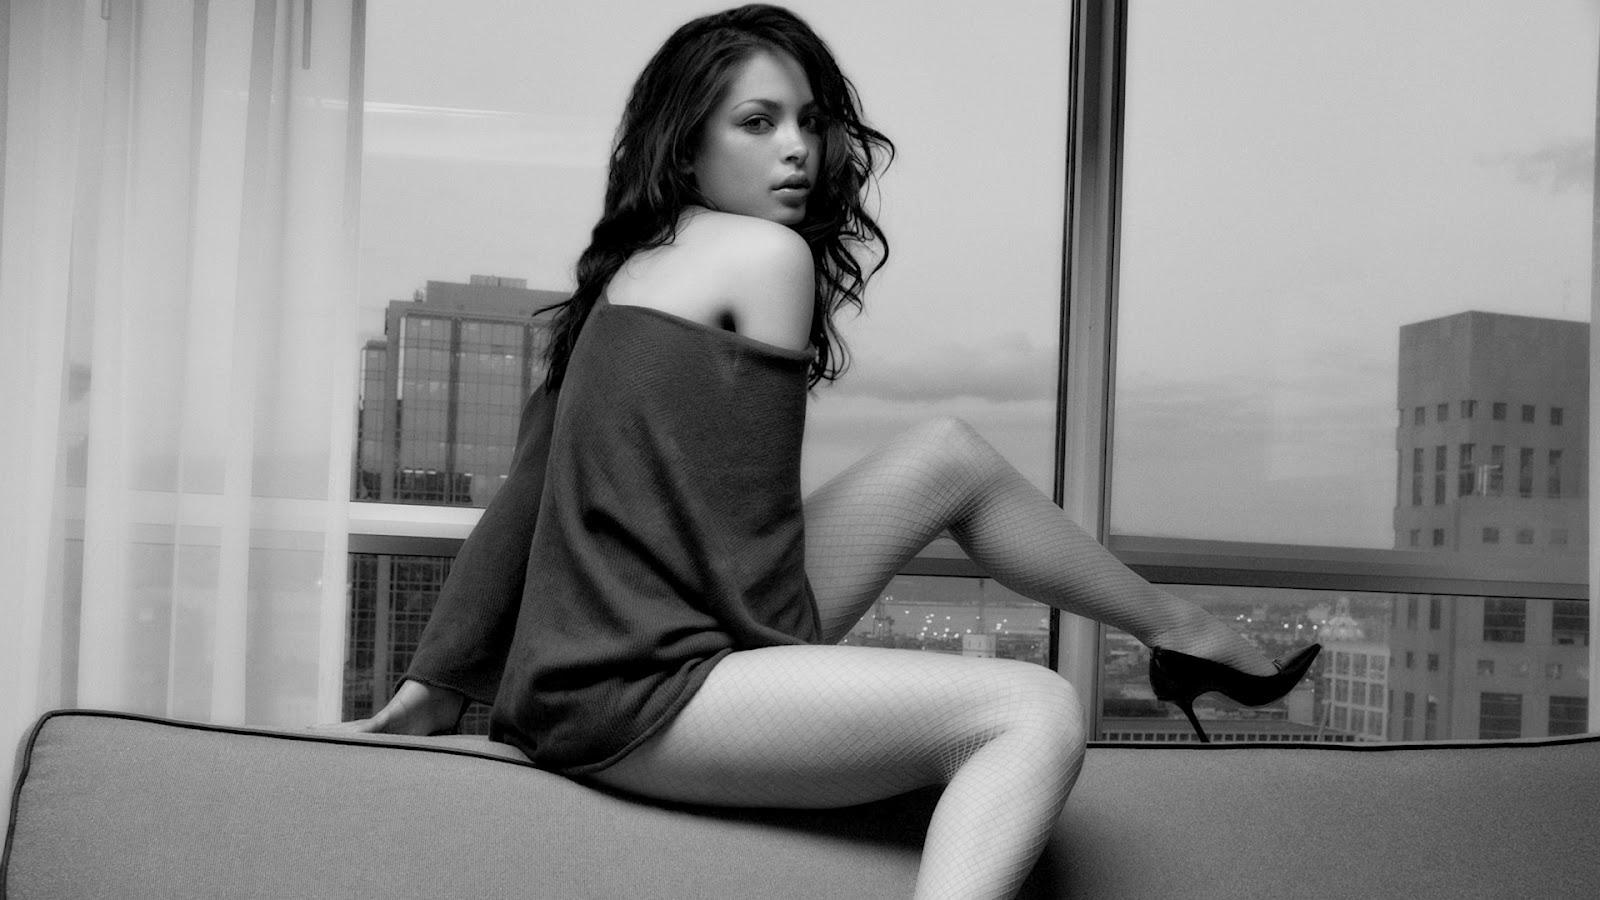 Alexa Bondar websites vids cumshot Twitter lesbian